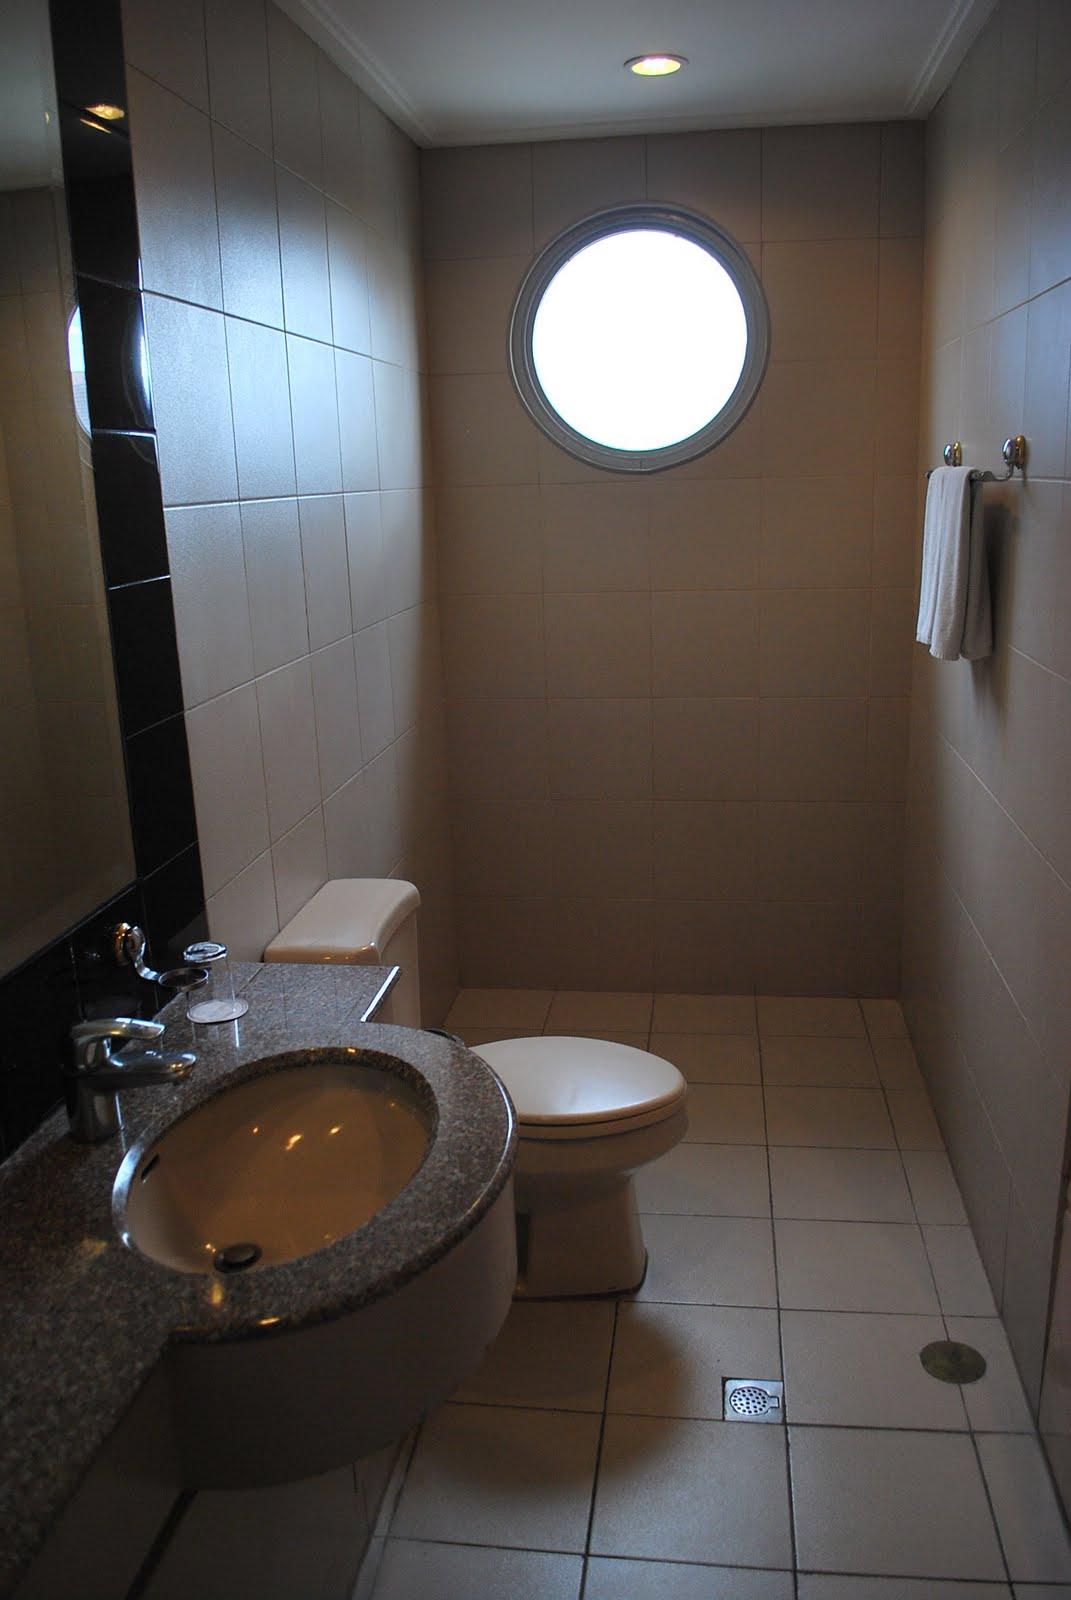 Bridal Shower Room Rental Vaughan